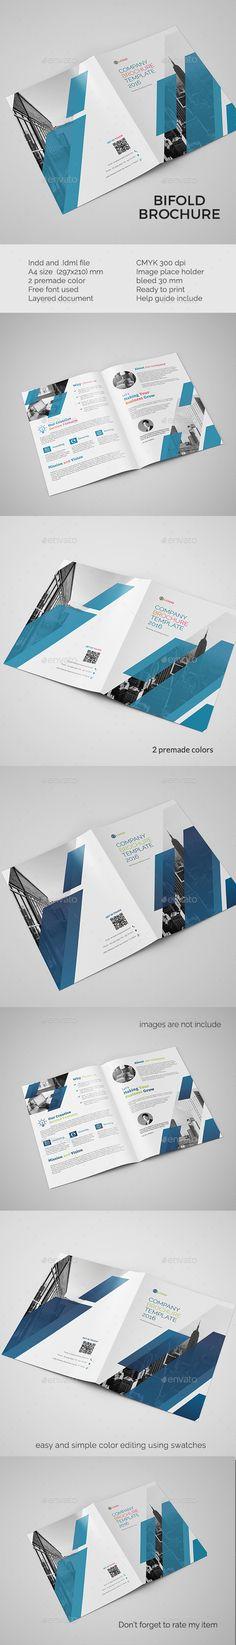 Corporate bifold brochure Design Idea - Corporate Brochure Template InDesign INDD. Download here: http://graphicriver.net/item/corporate-bifold-brochure/16477735?s_rank=345&ref=yinkira